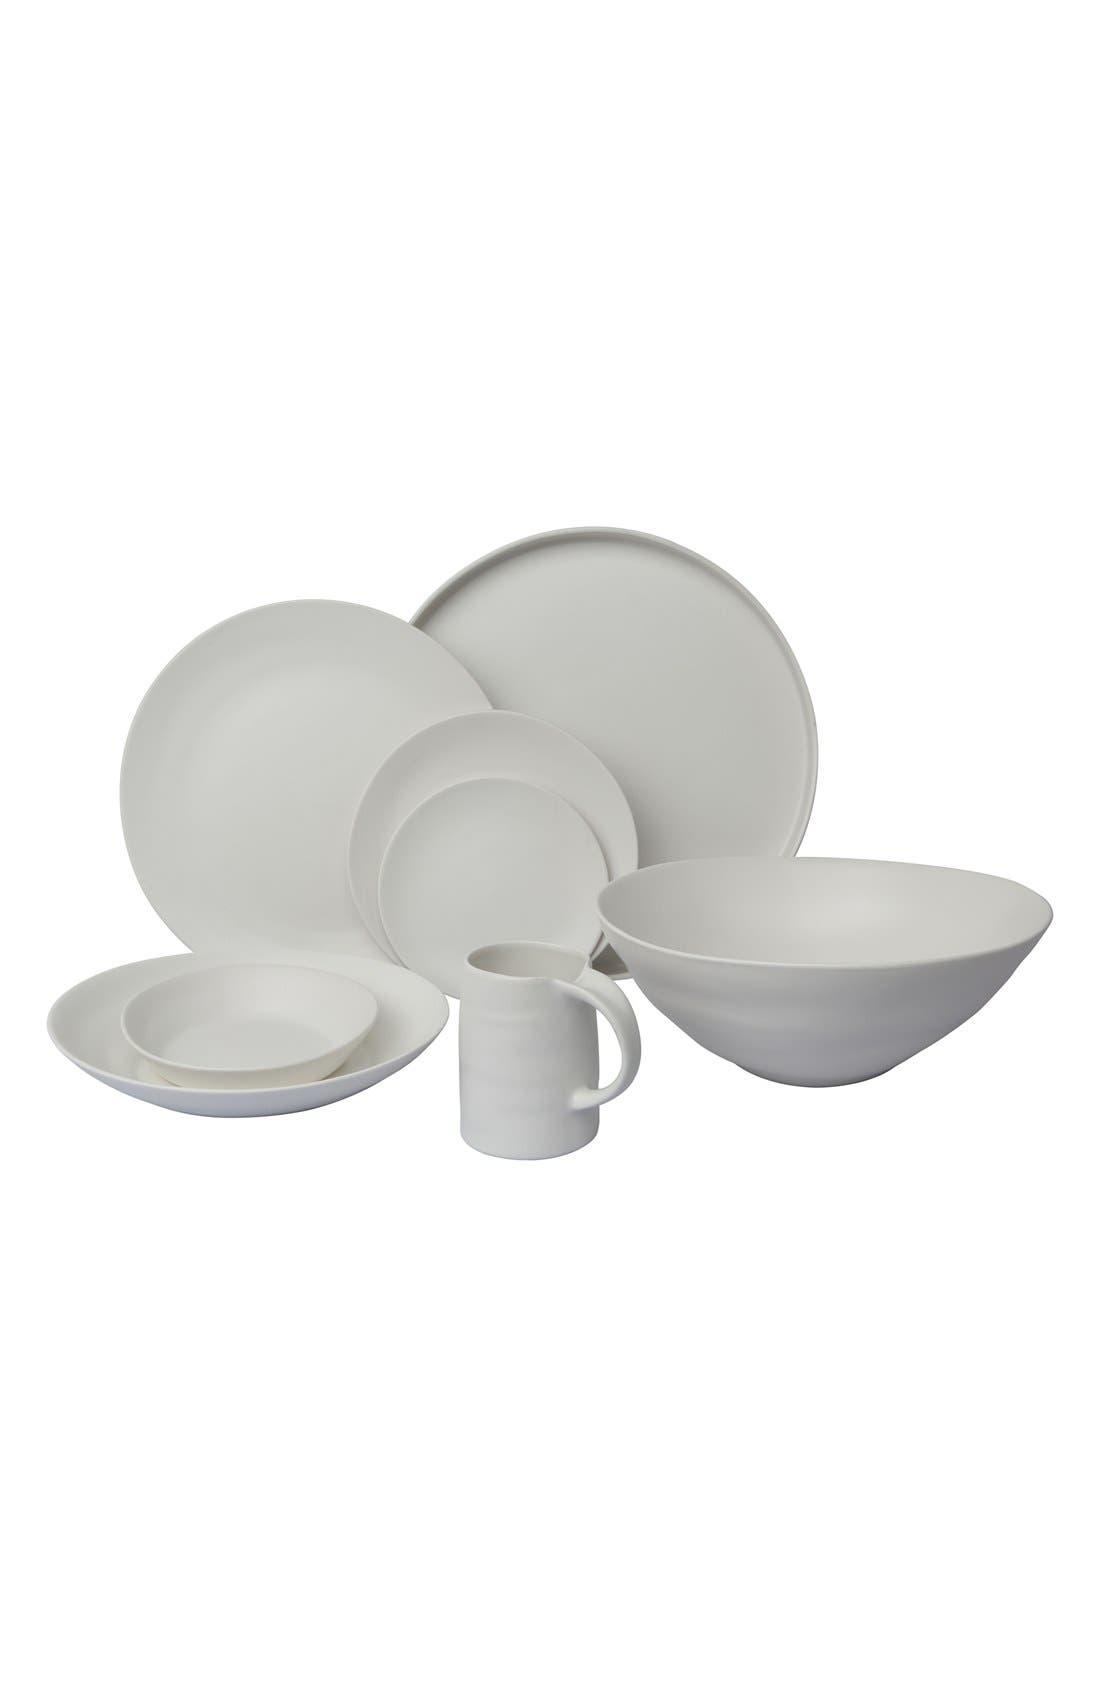 'Ripple' Porcelain Serving Bowl,                             Alternate thumbnail 2, color,